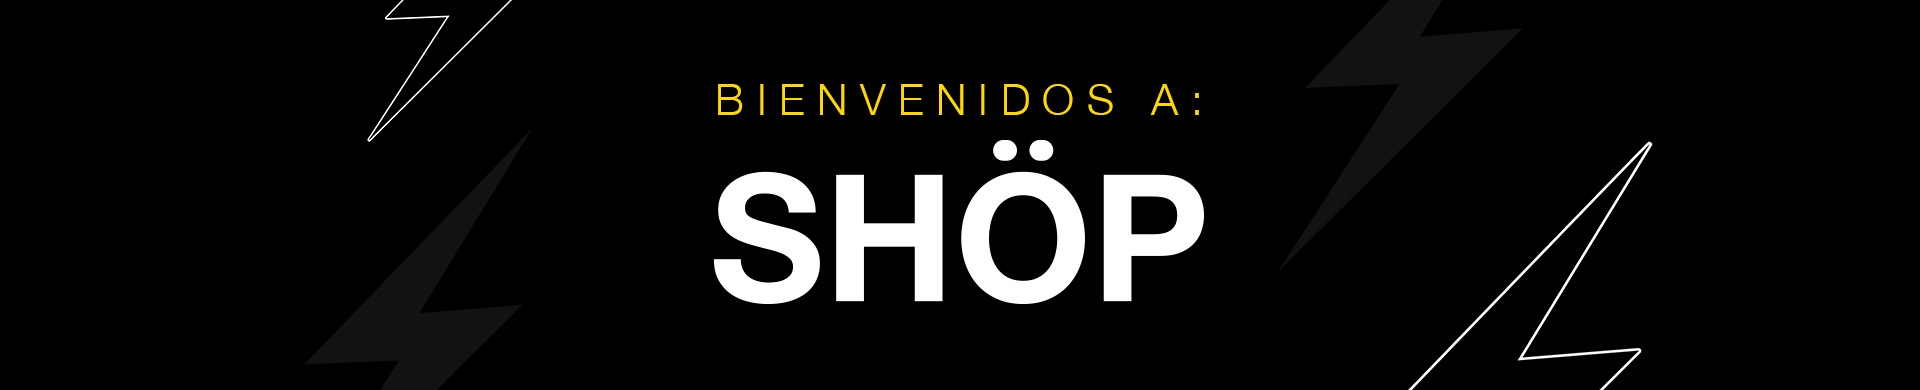 Bienvenidos-a-SHOP.png